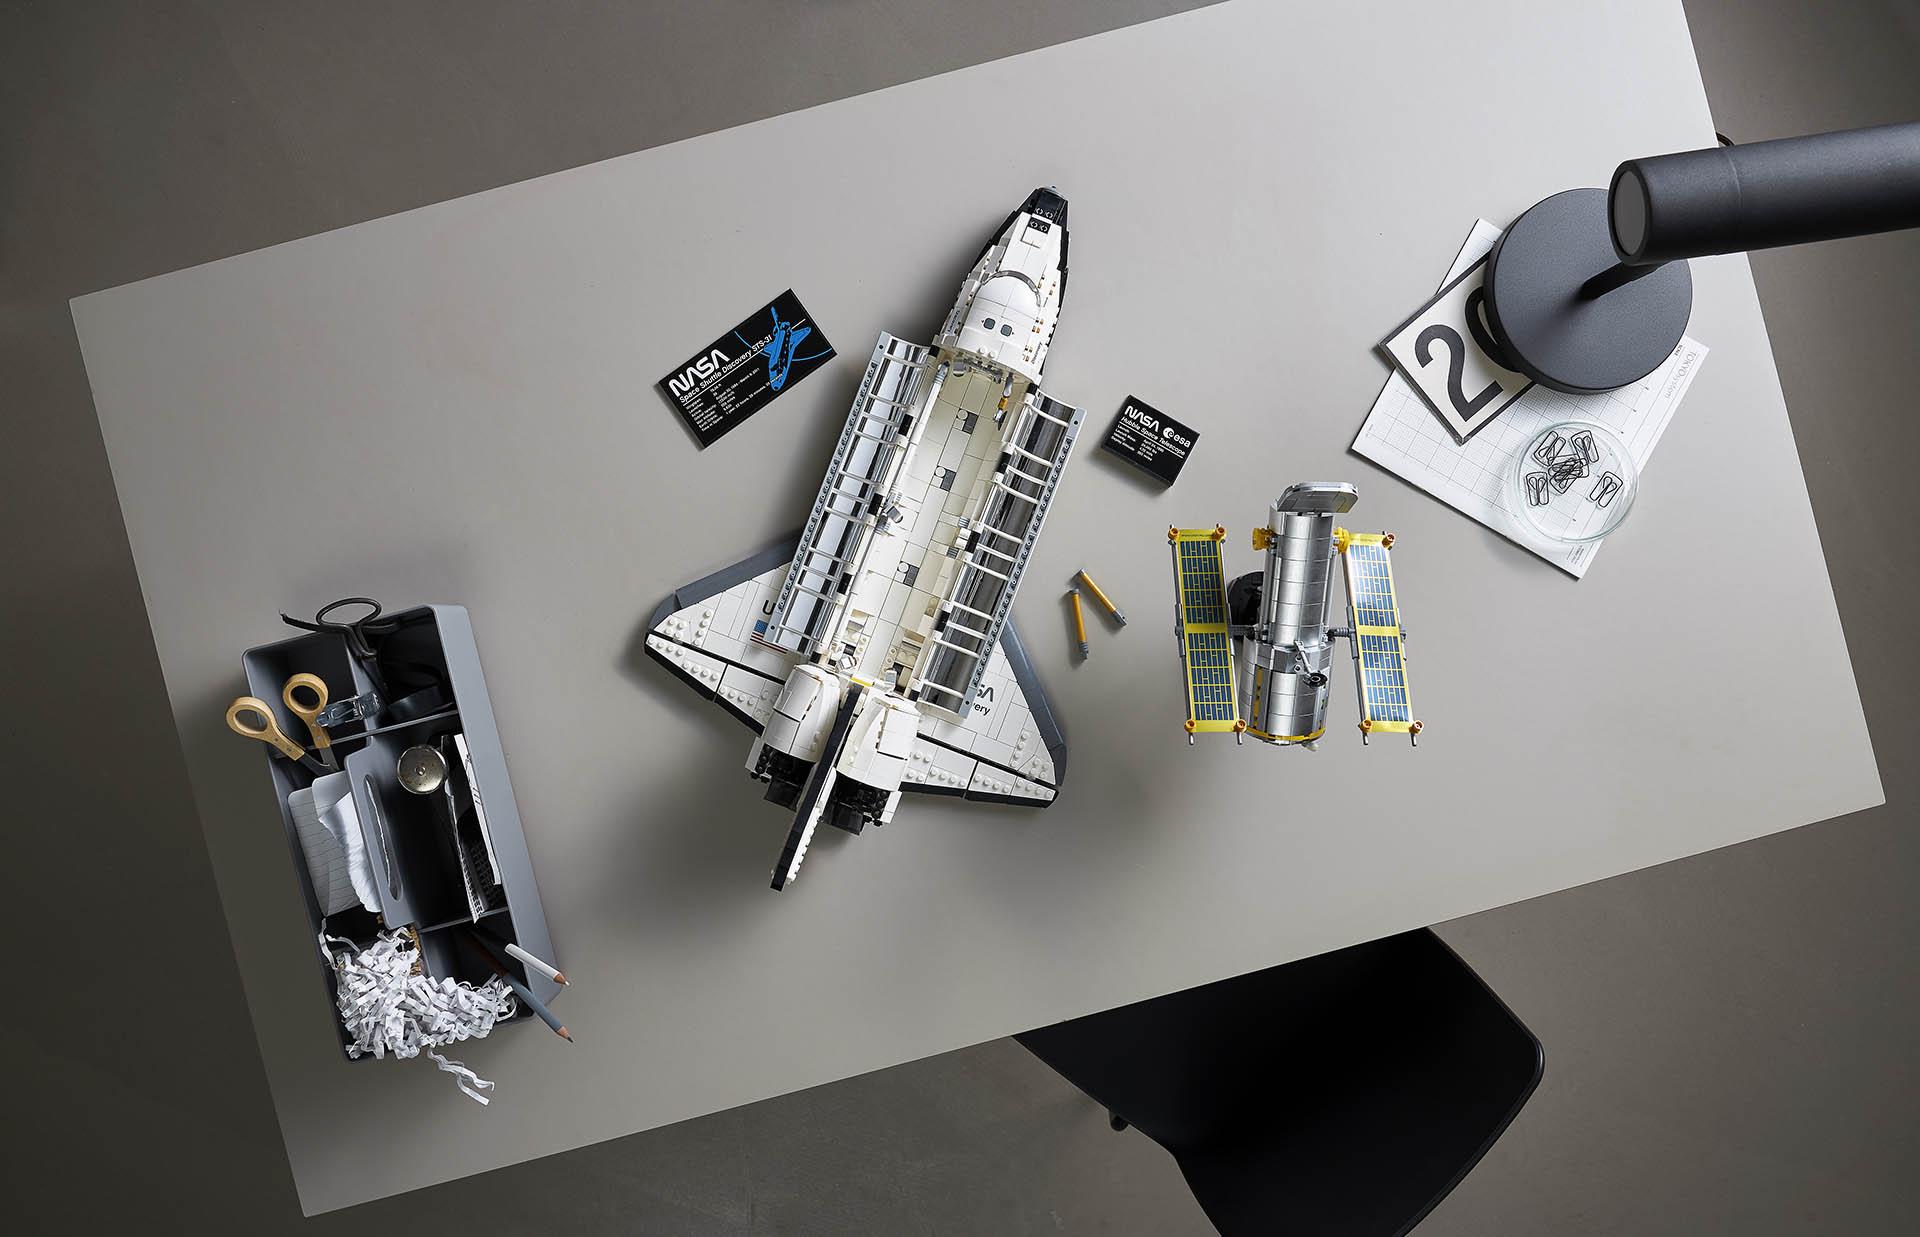 LEGO NASA Space Shuttle Discovery 7